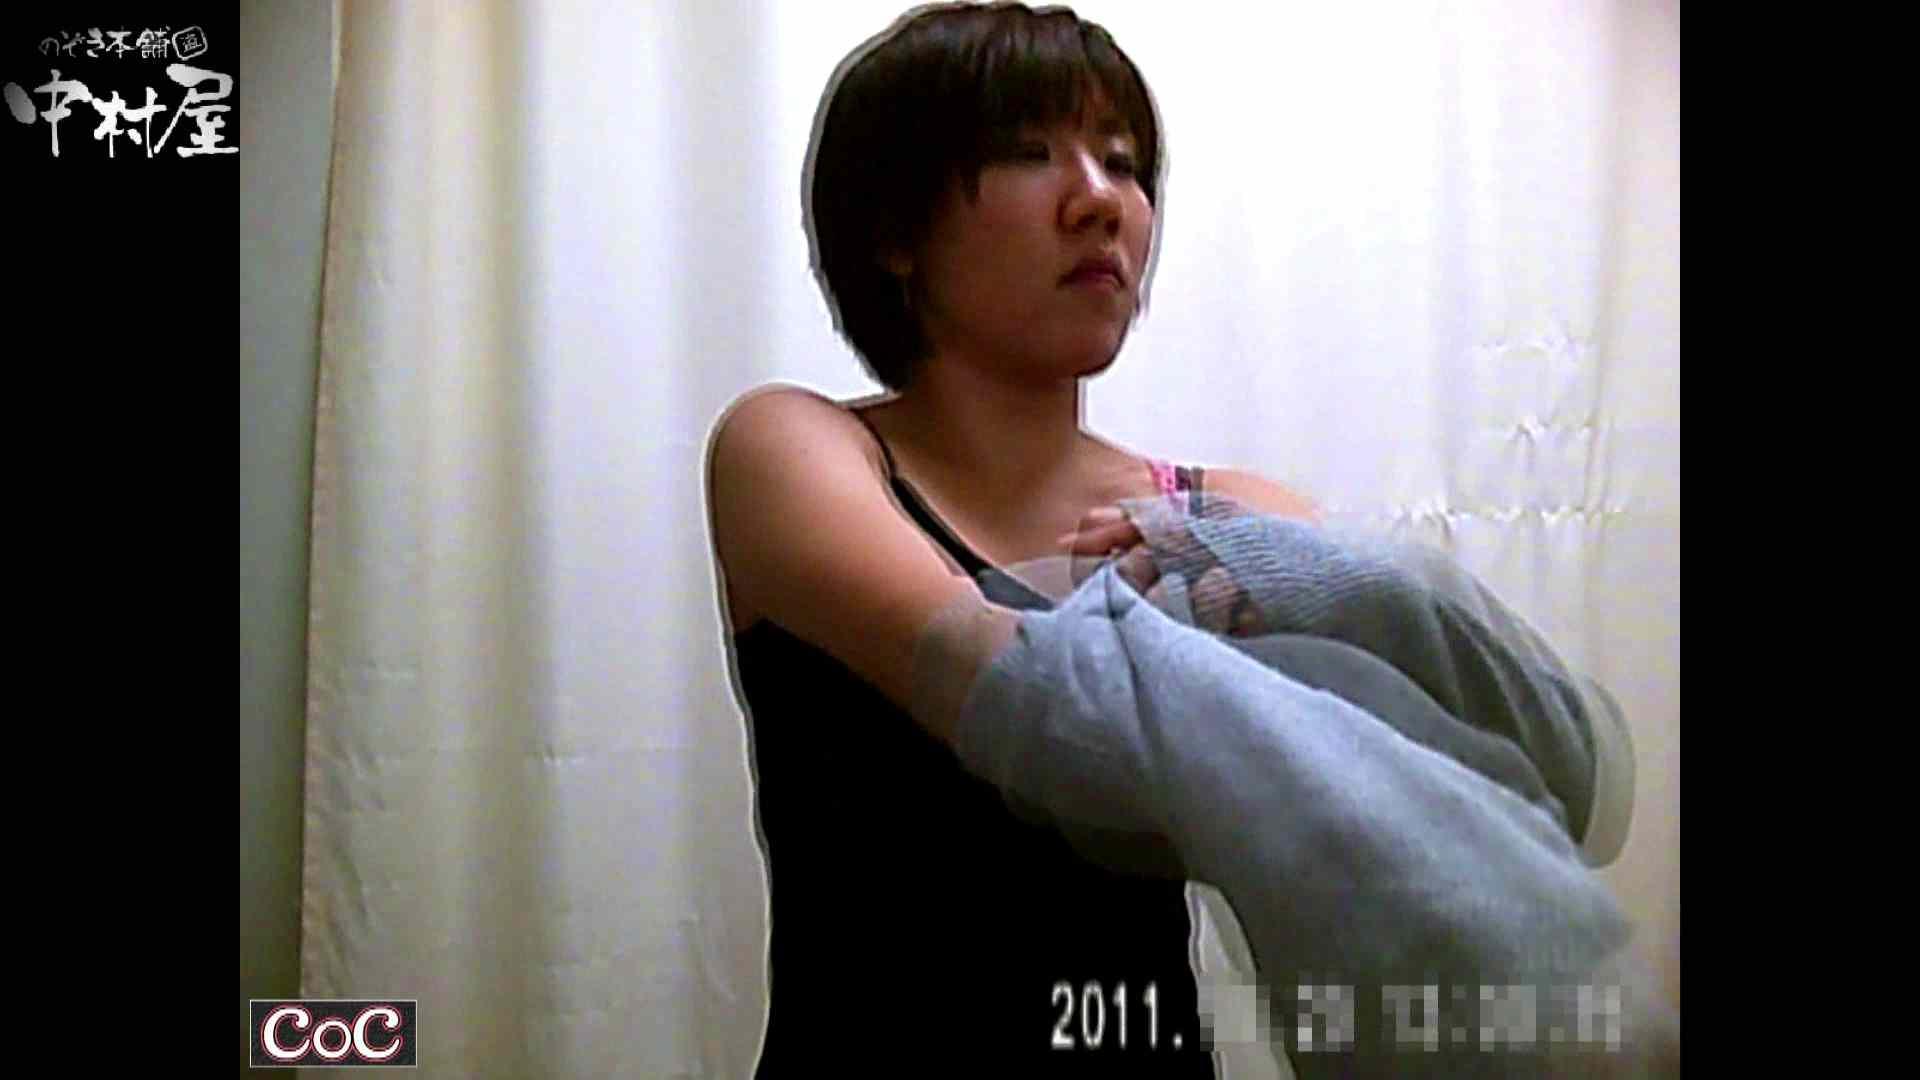 Doctor-X元医者による反抗vol.65 おまんこ見放題 | 盗撮シリーズ  102PIX 65